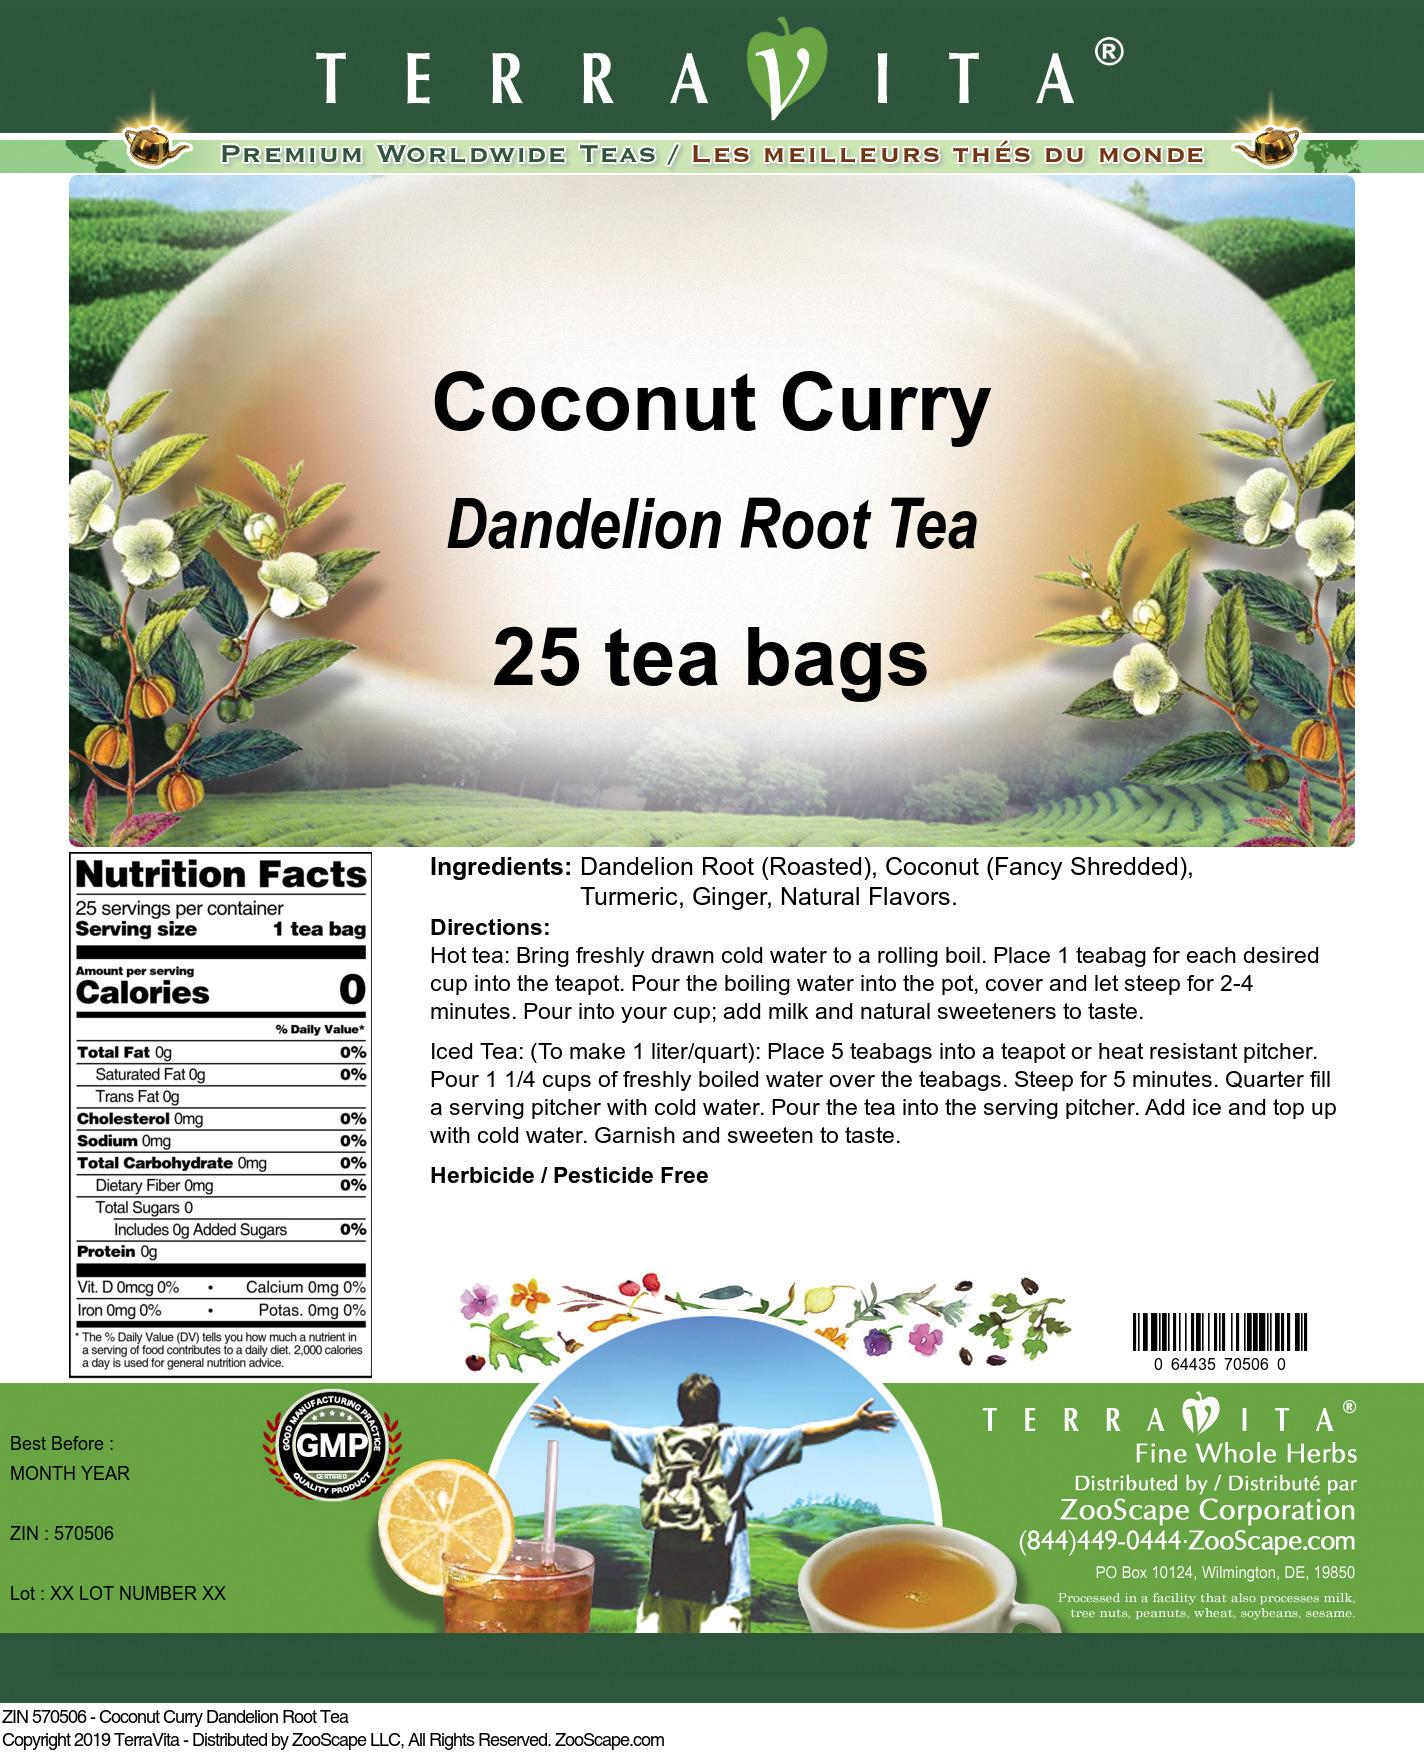 Coconut Curry Dandelion Root Tea